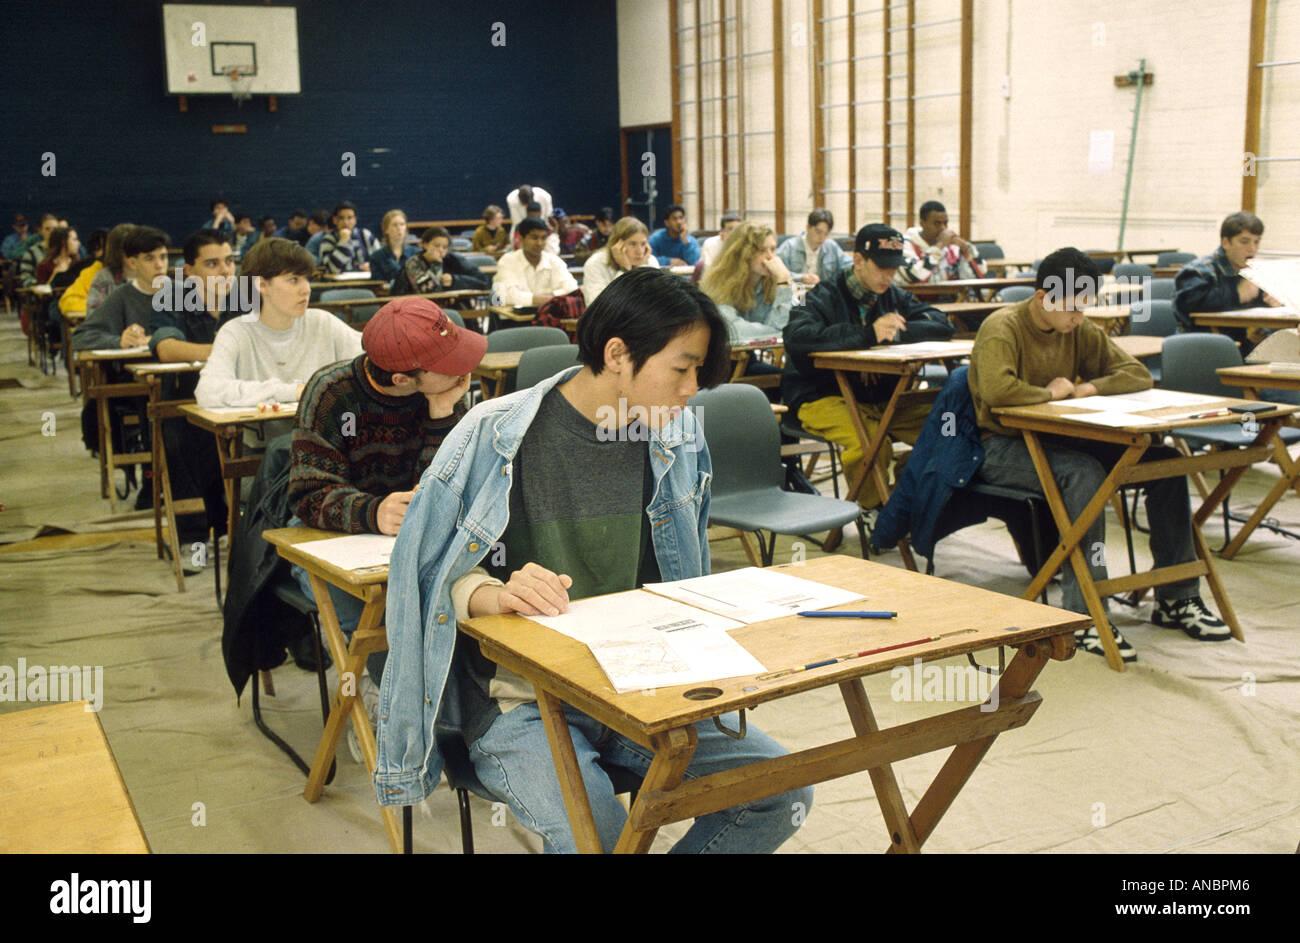 secondary school exams - Stock Image